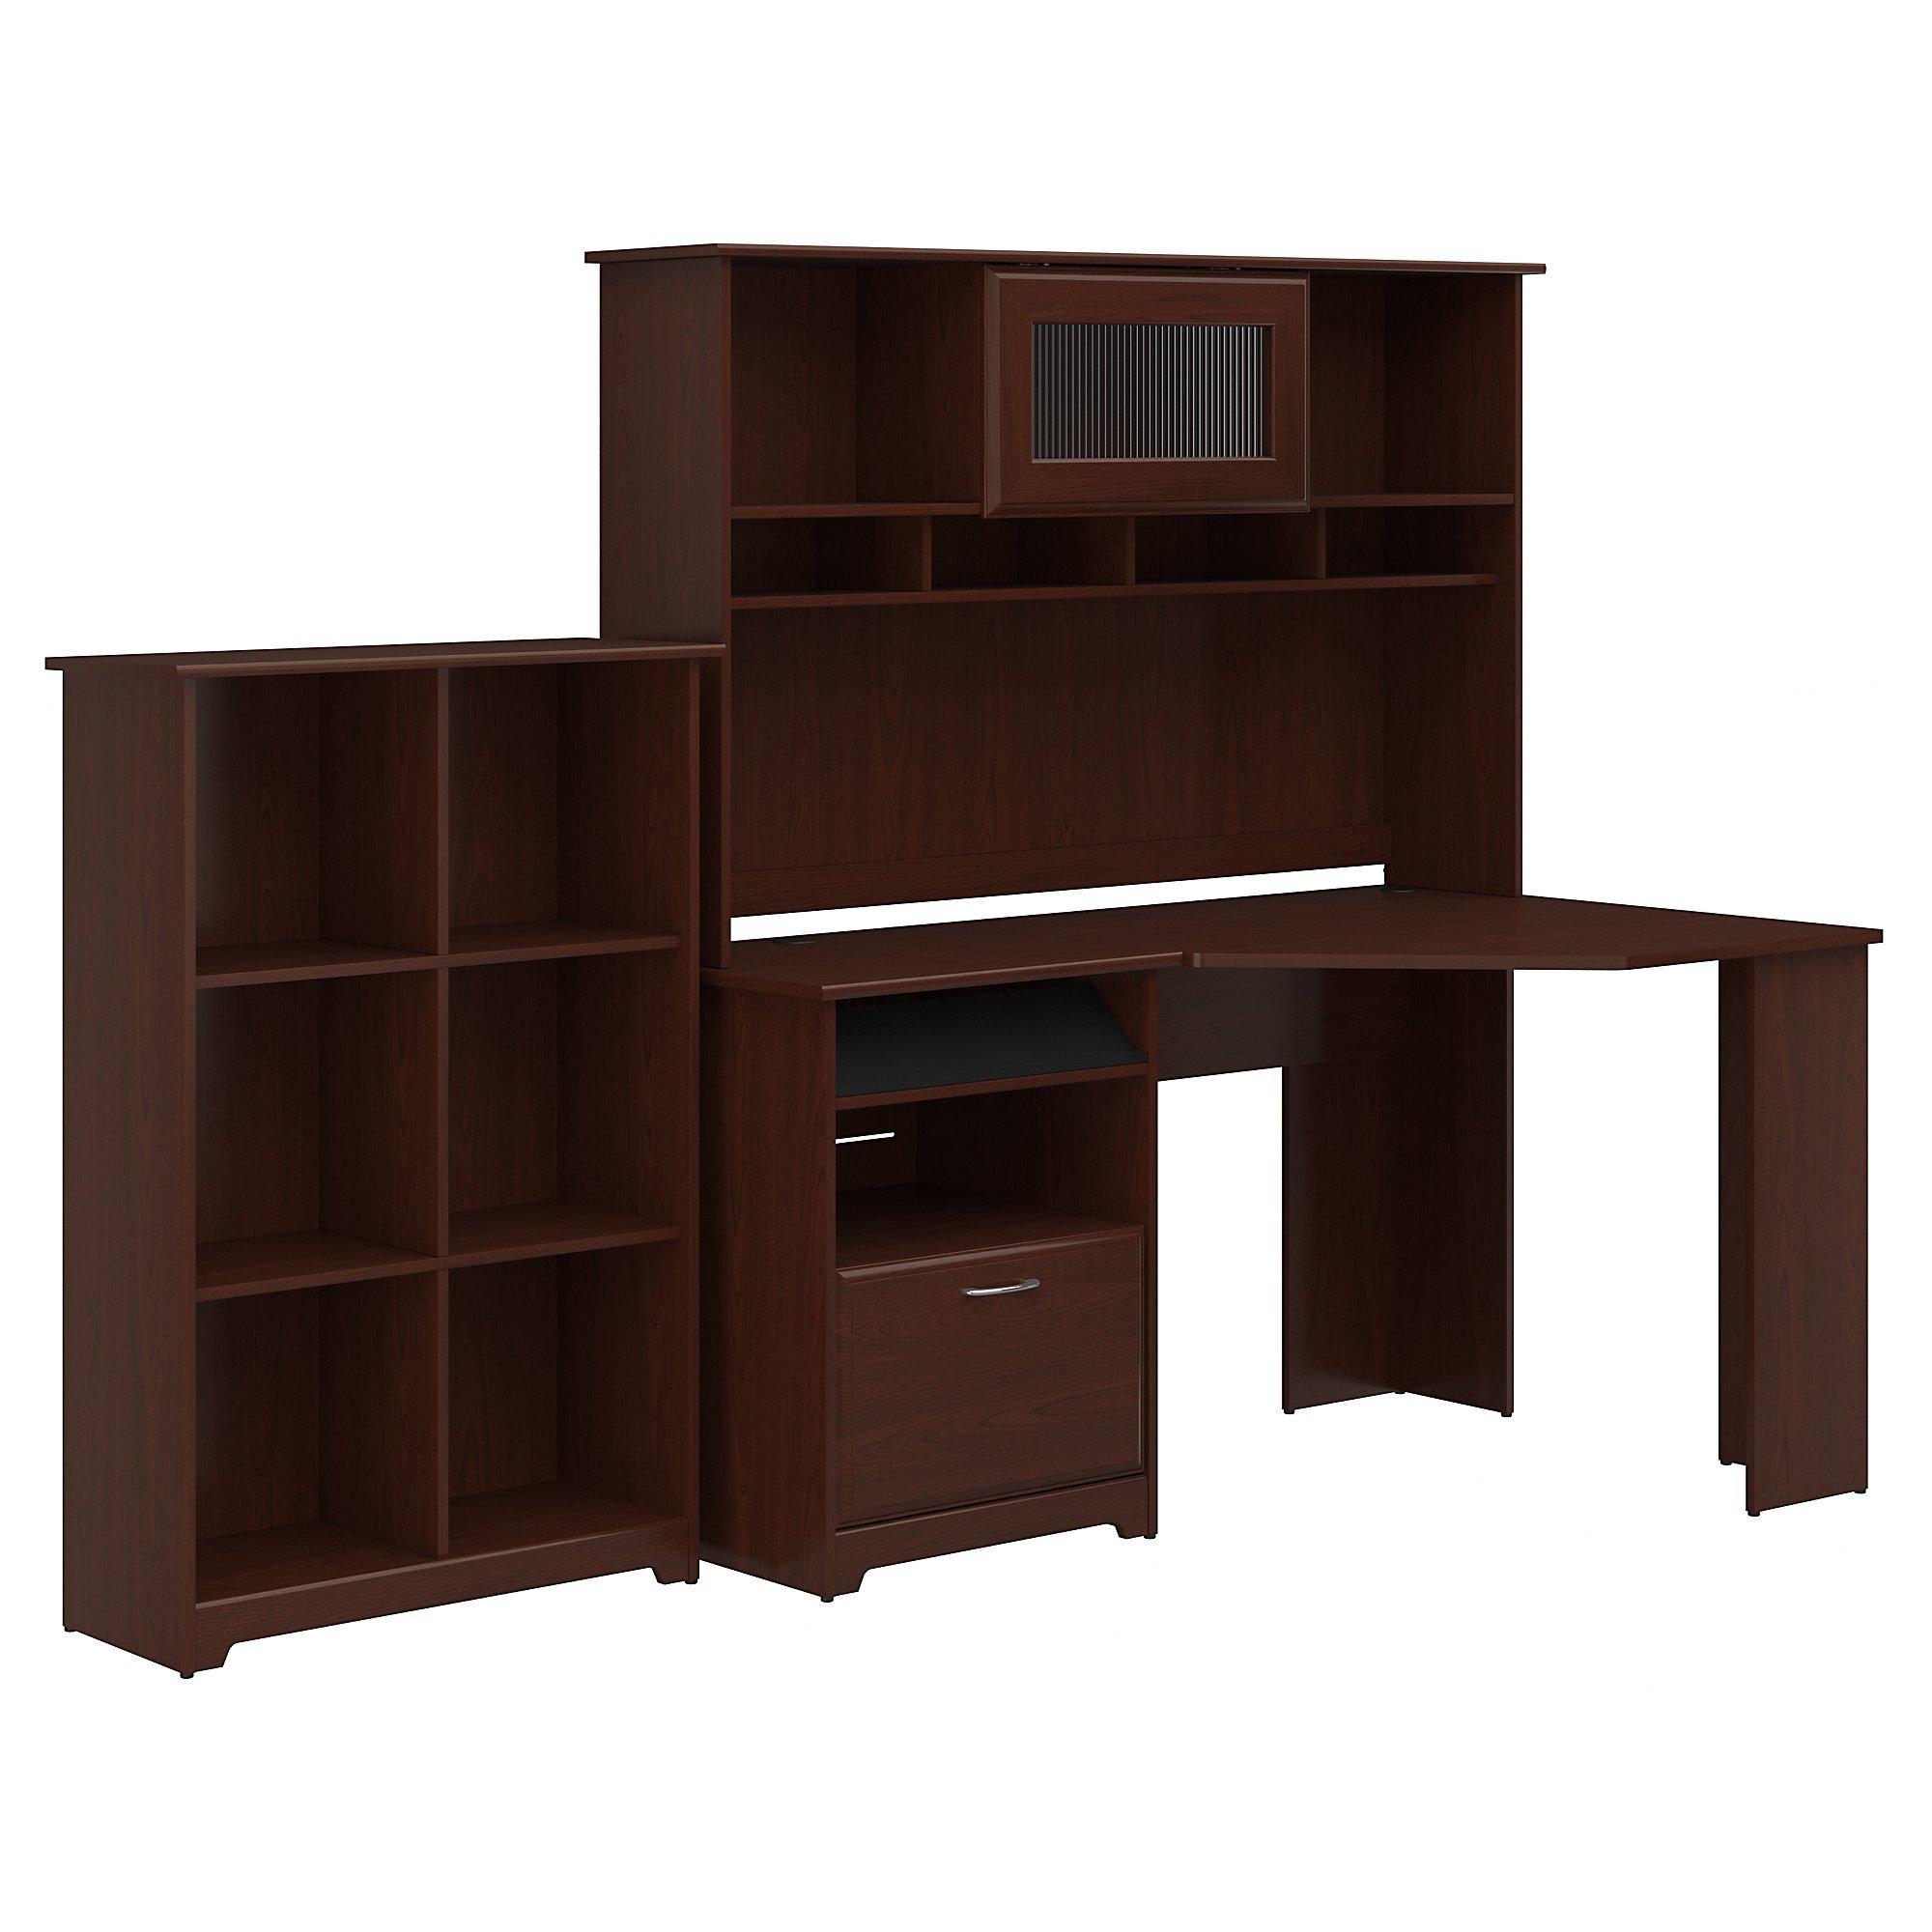 Bush Furniture Cabot Corner Desk with Hutch and 6 Cube Organizer in Harvest Cherry by Bush Furniture